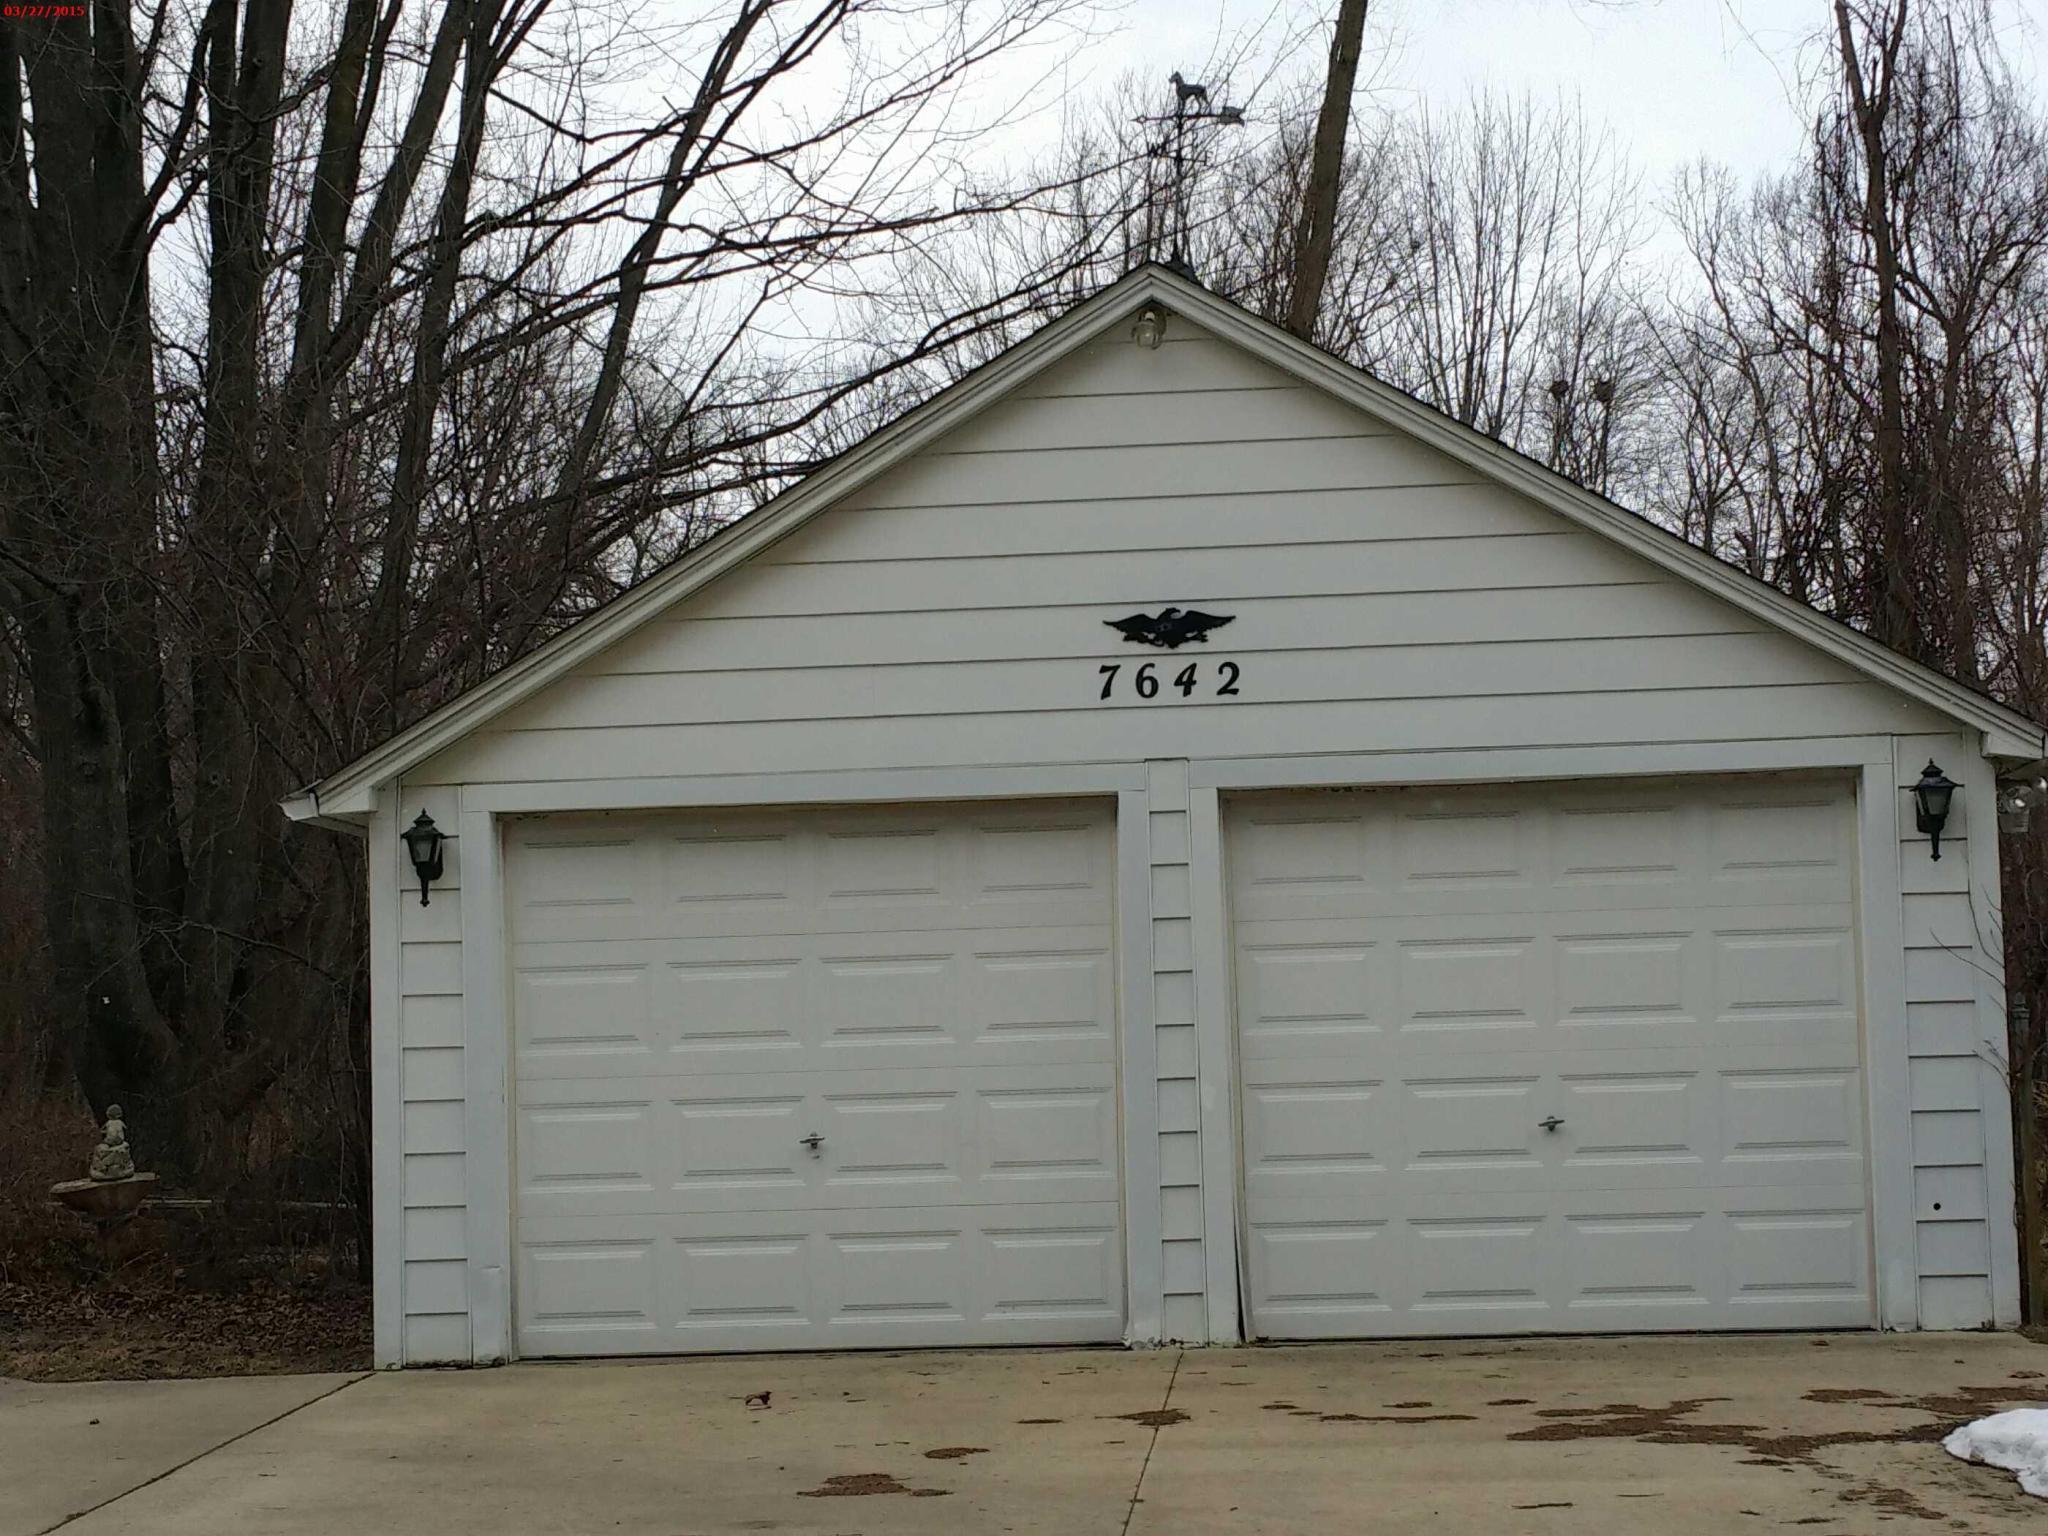 7642 Pontiac Lake Rd Waterford Mi 48327 Estimate And Home Garage